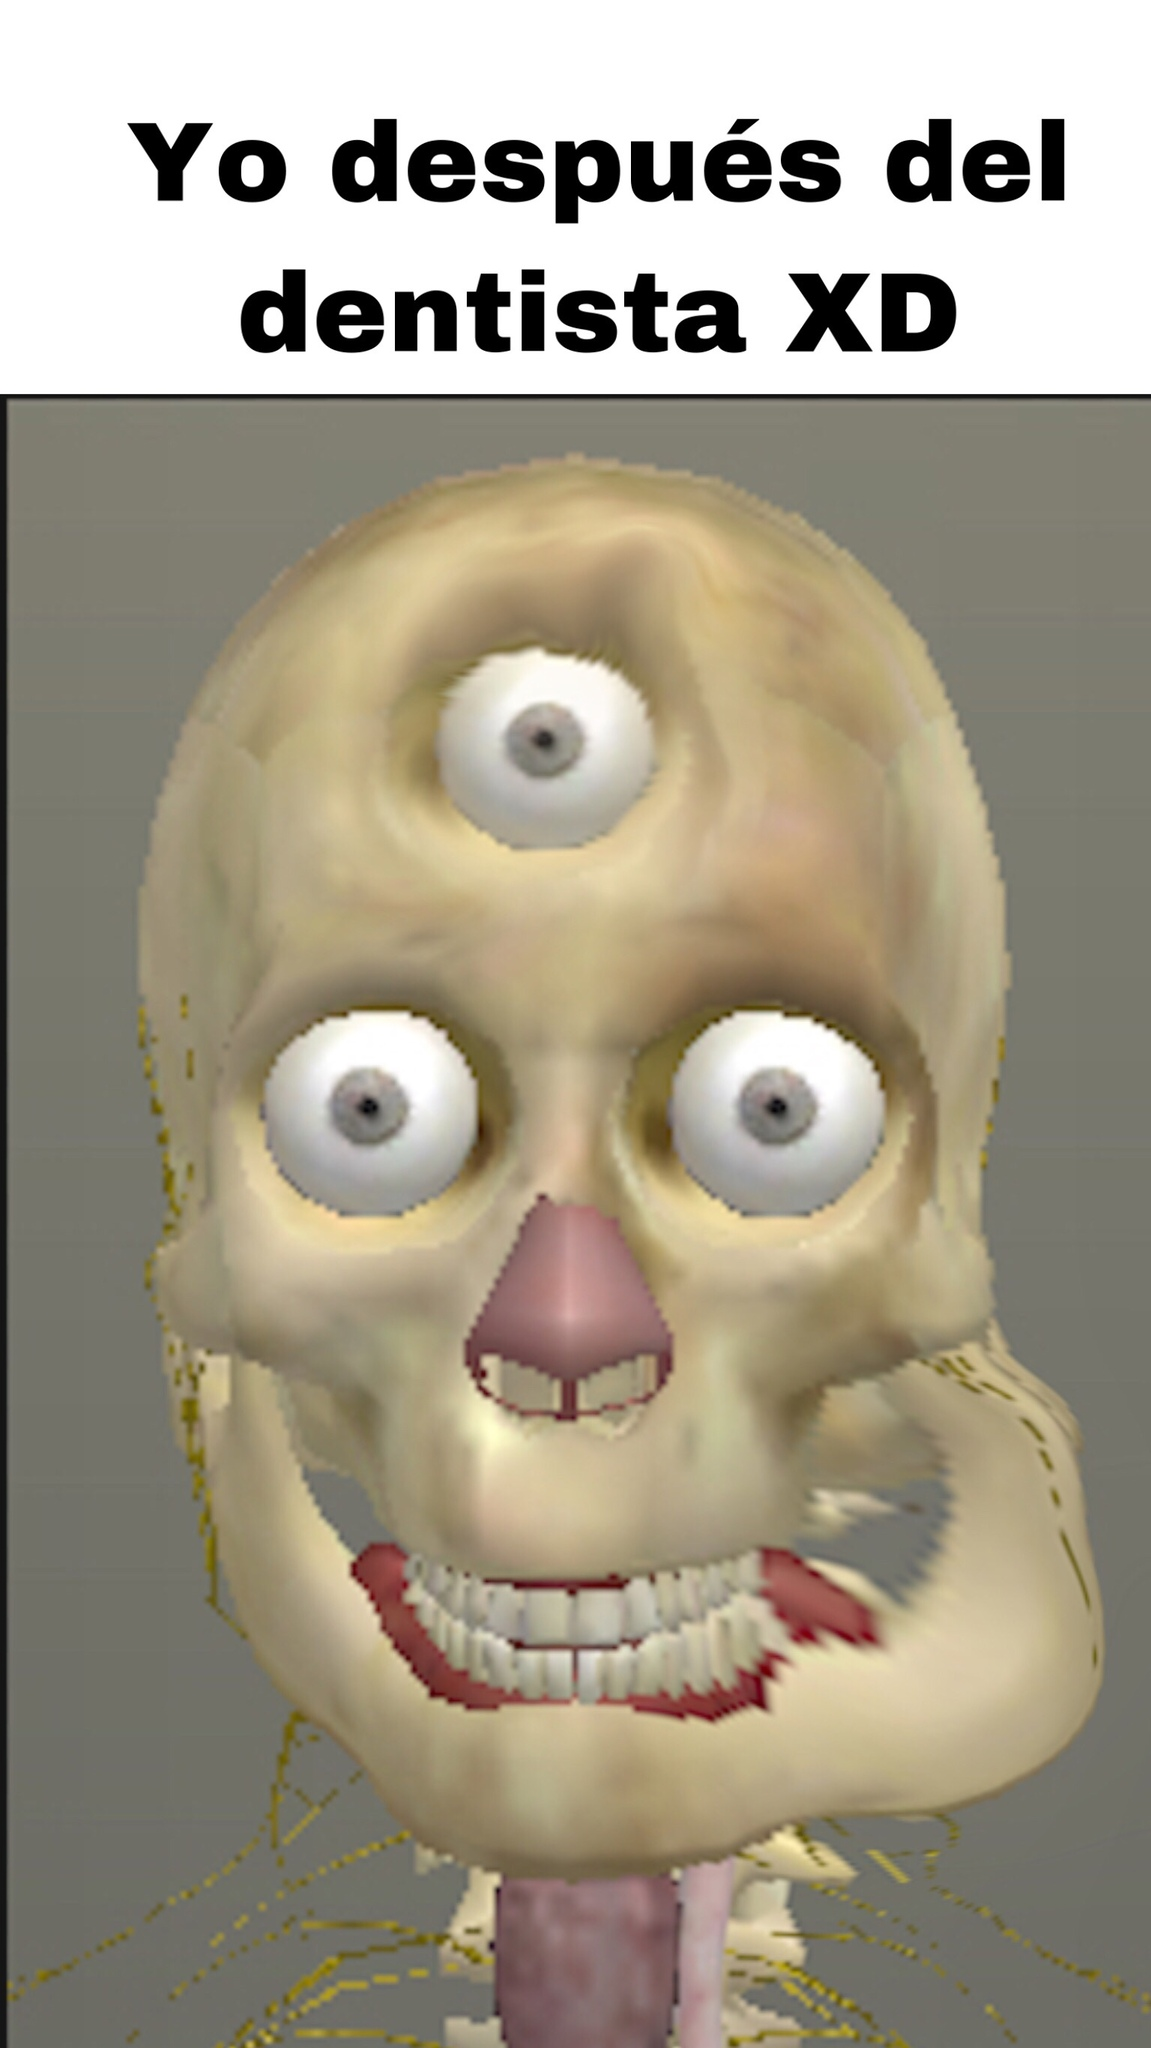 no miren el tercer ojo - meme